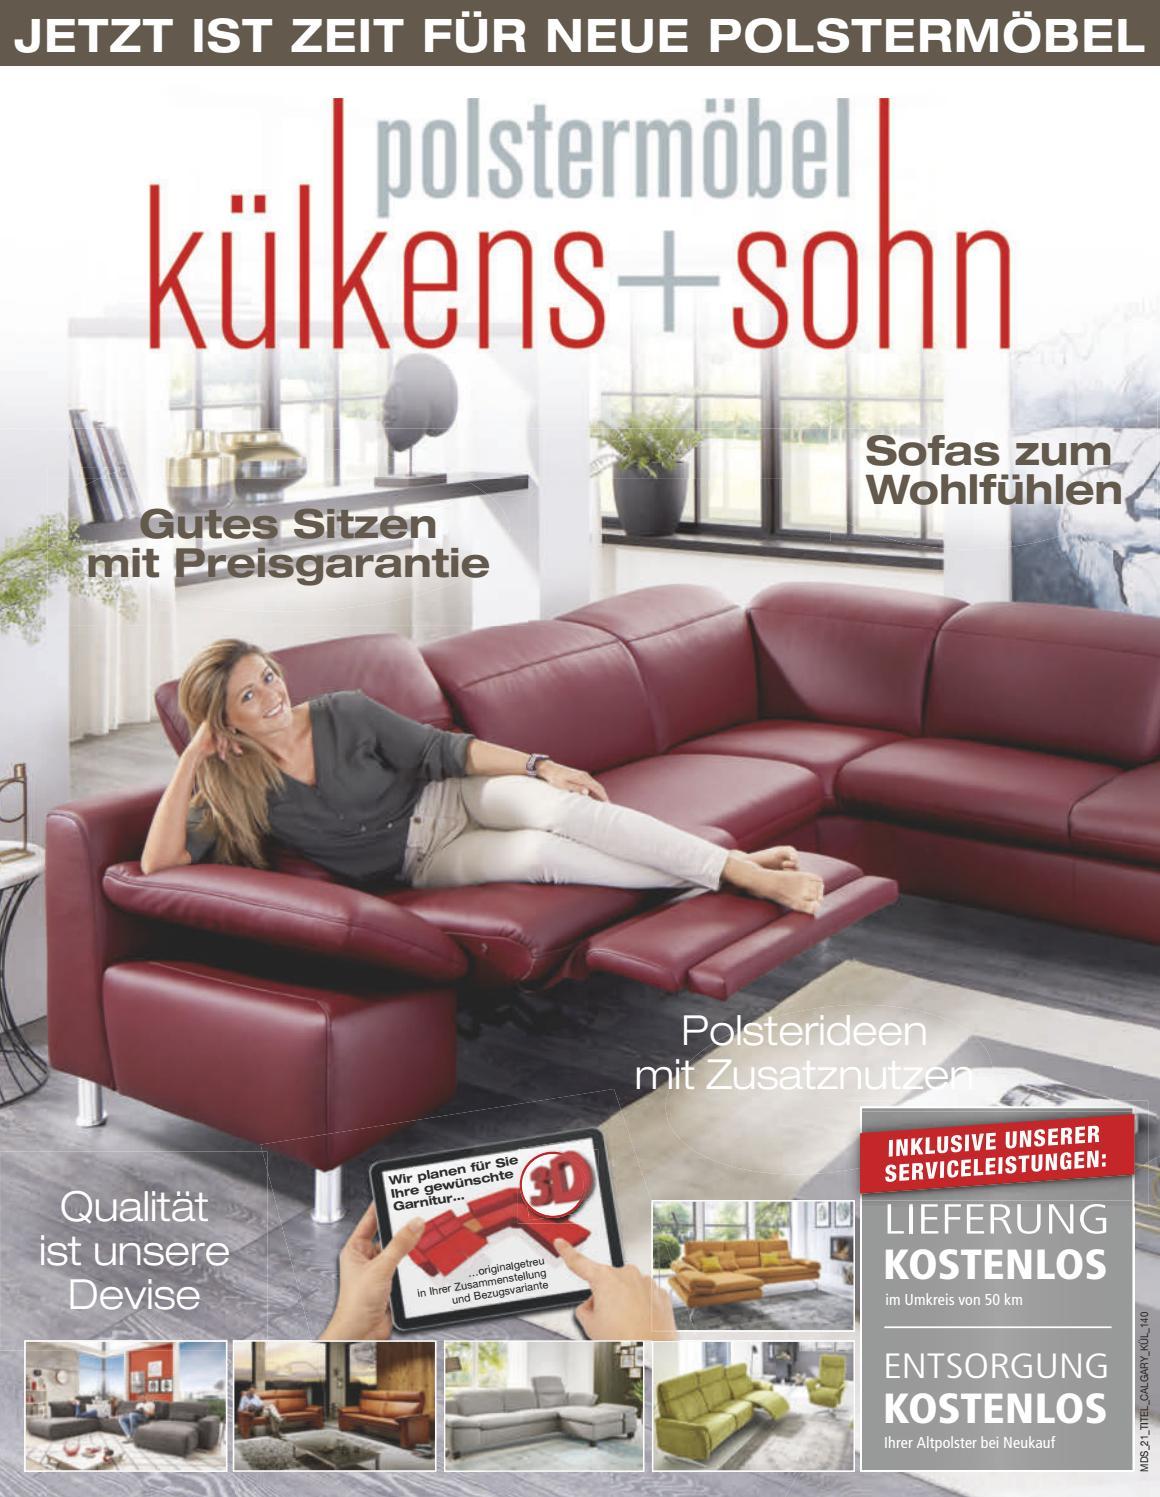 kuelkens+sohn Prospekt Polster 10-2017 by Perspektive Werbeagentur ...